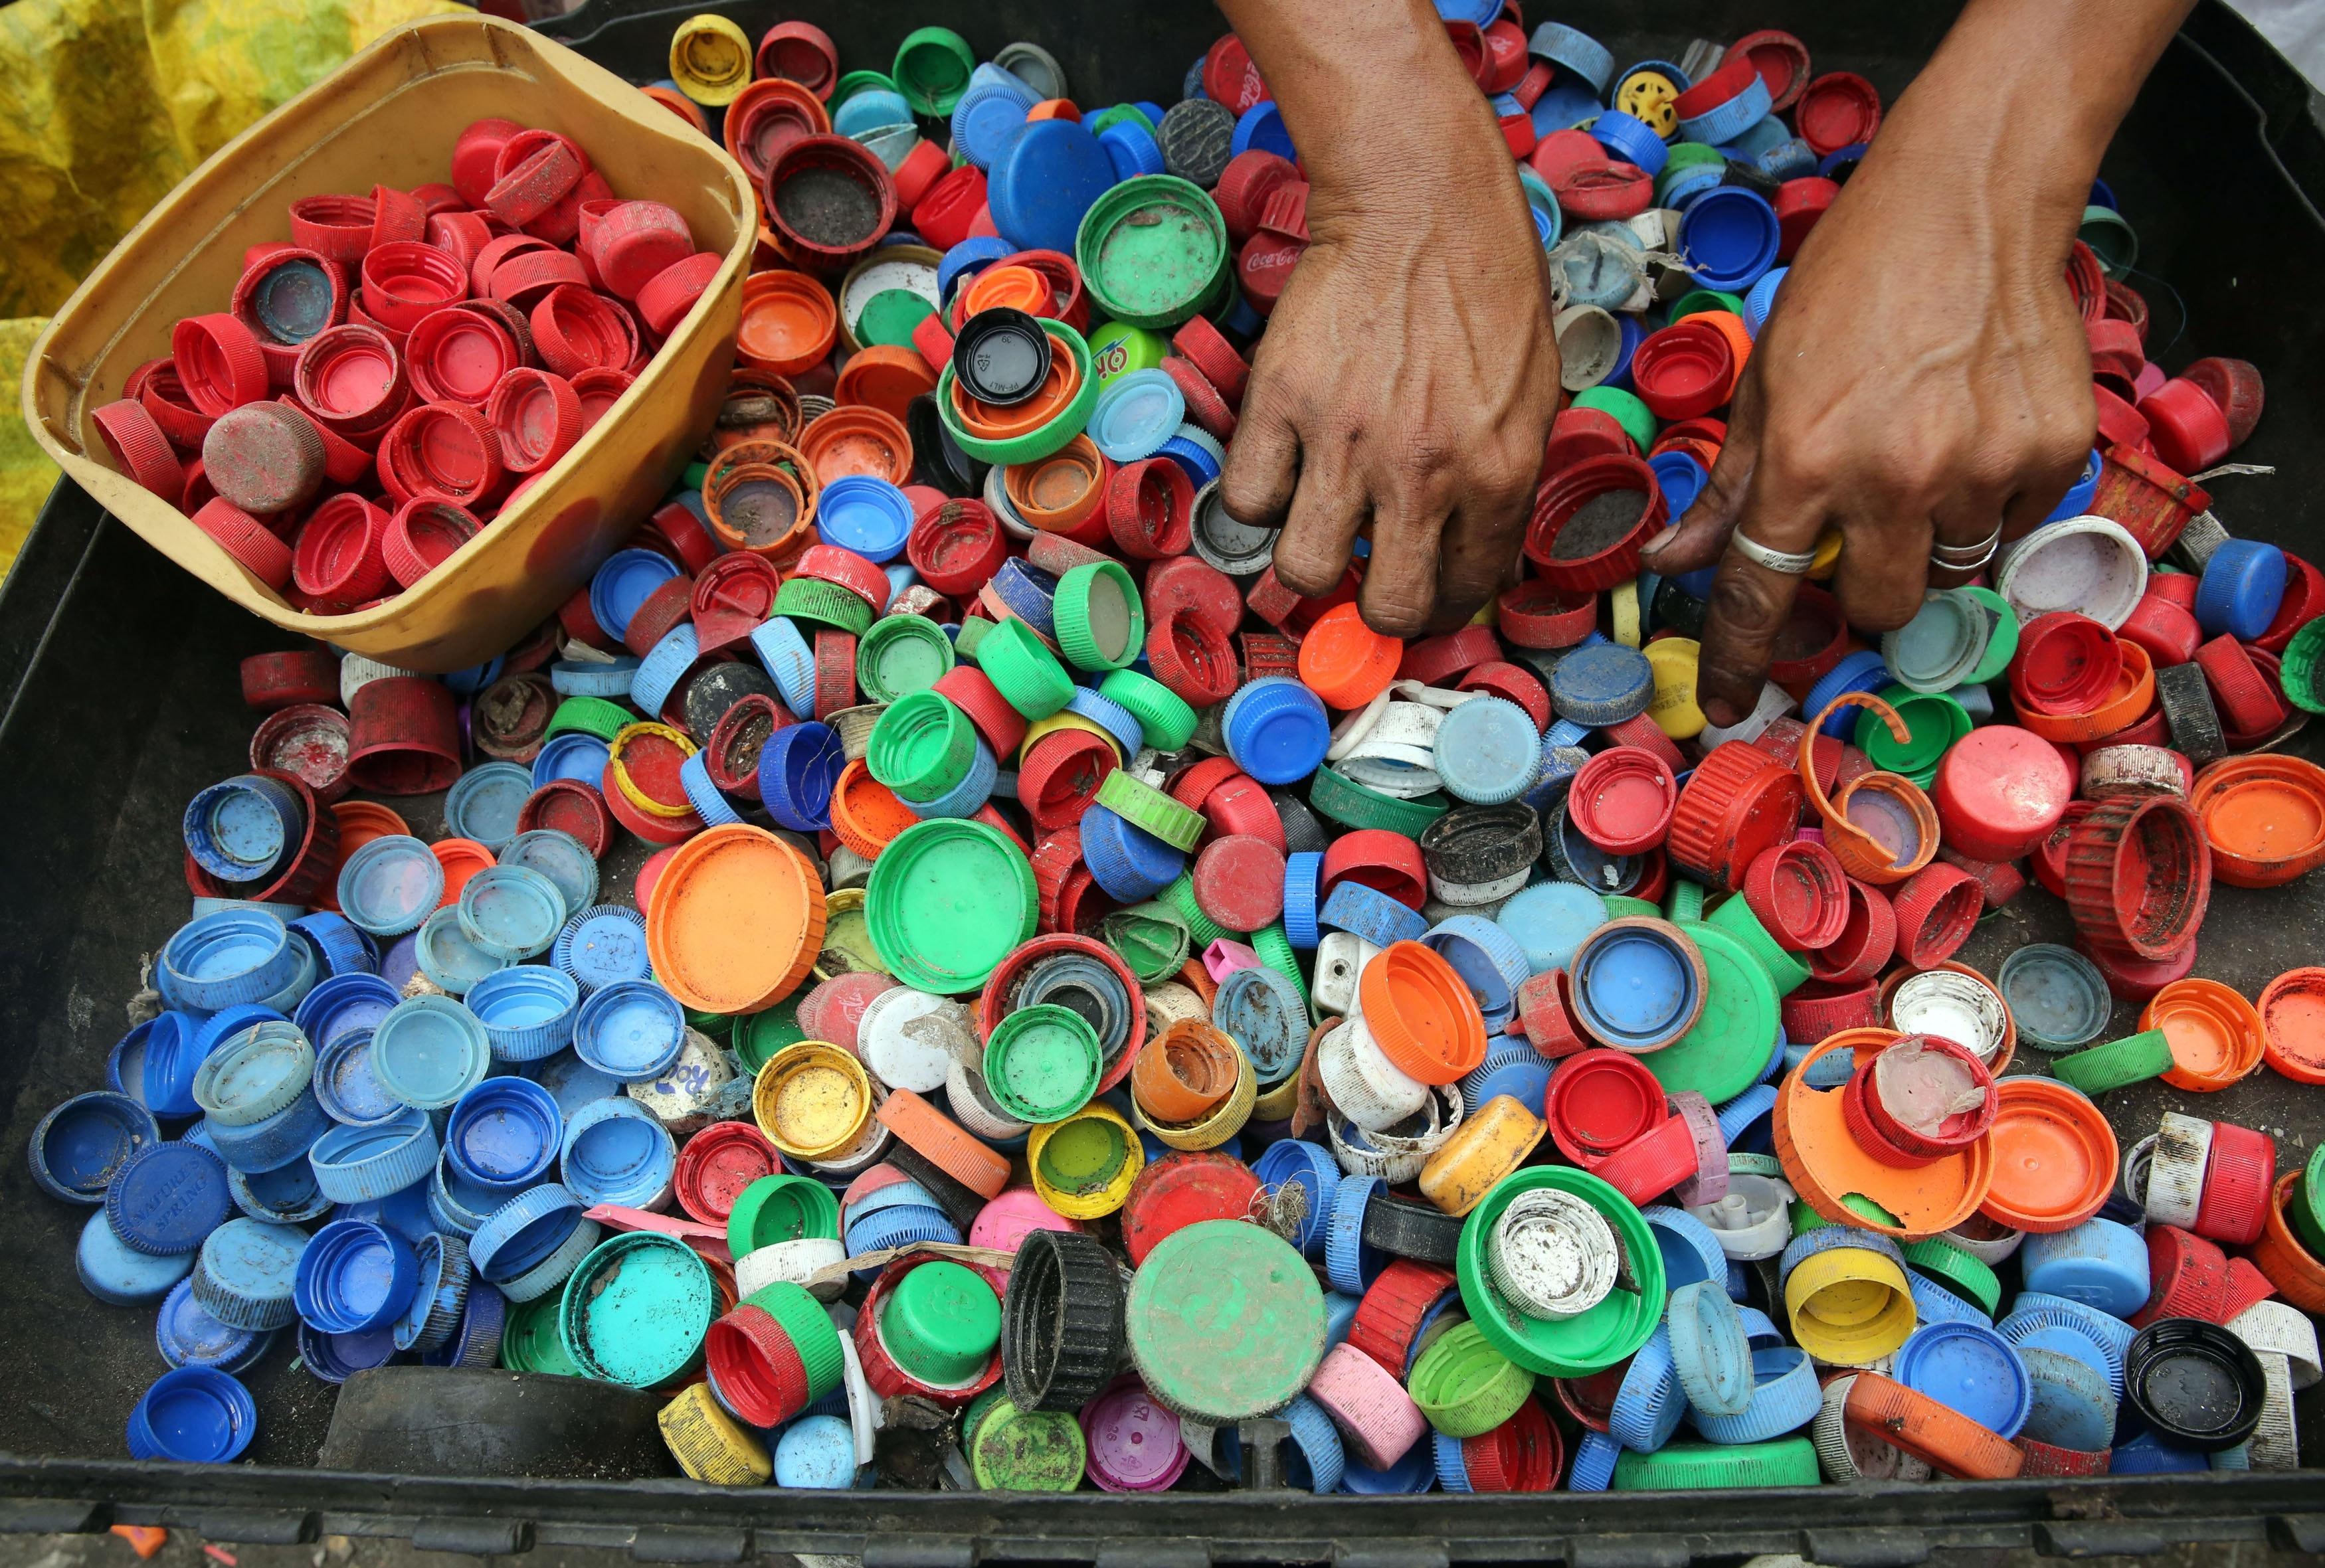 Global Plastic Action Partnership